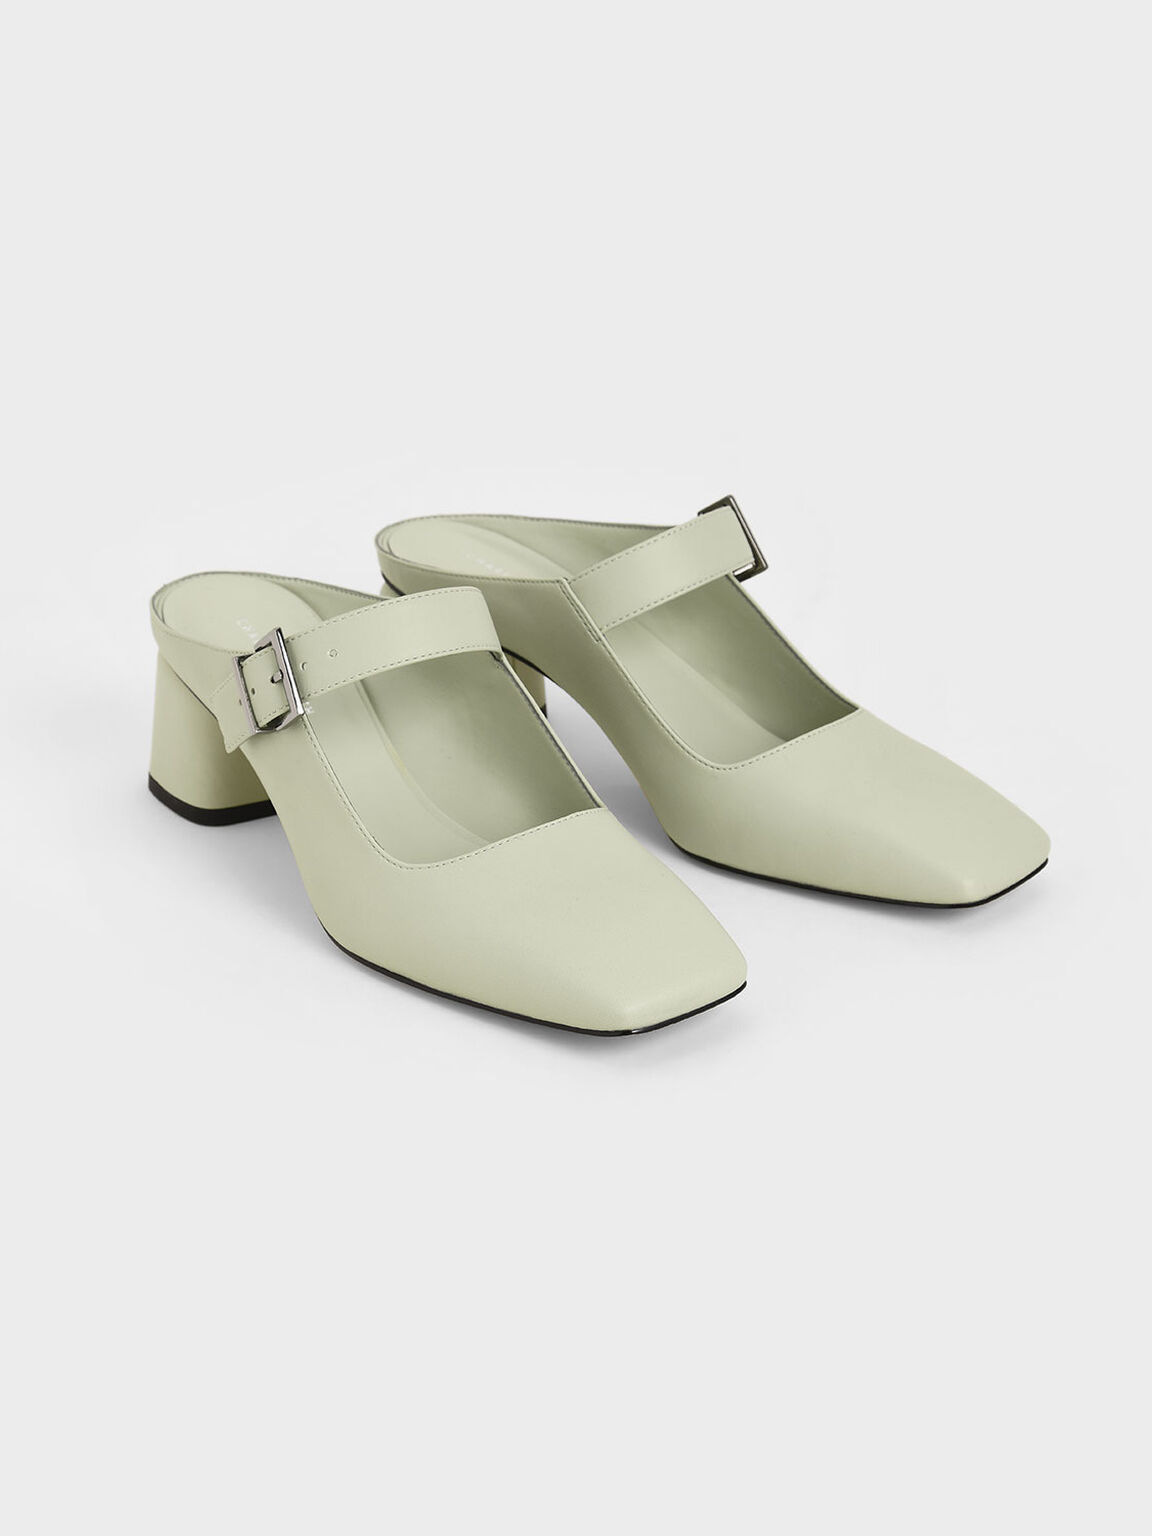 Mary Jane Block Heel Mules, Mint Green, hi-res